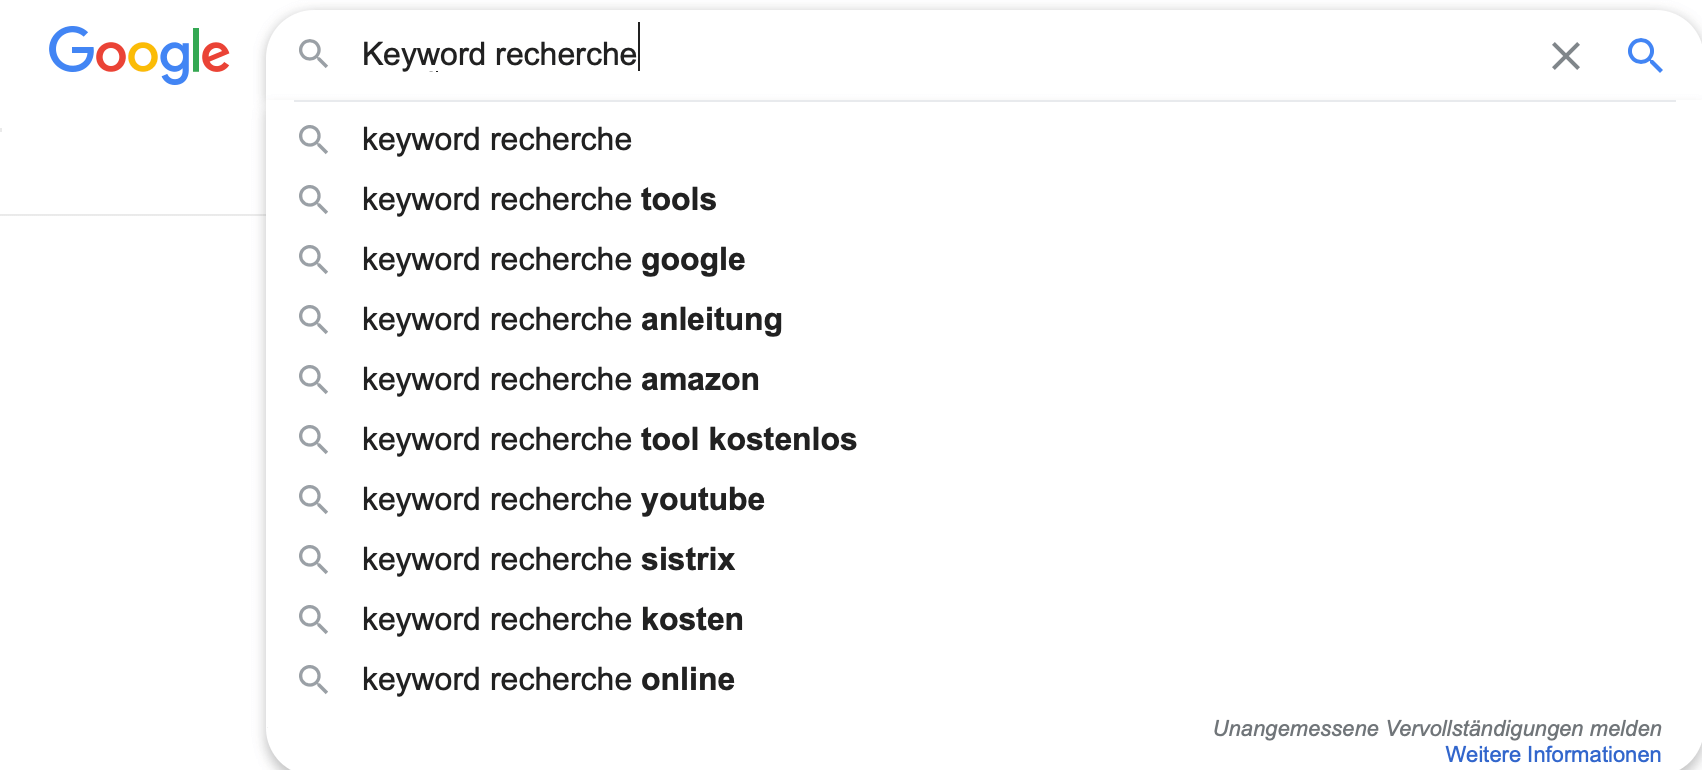 Keyword Recherche Google